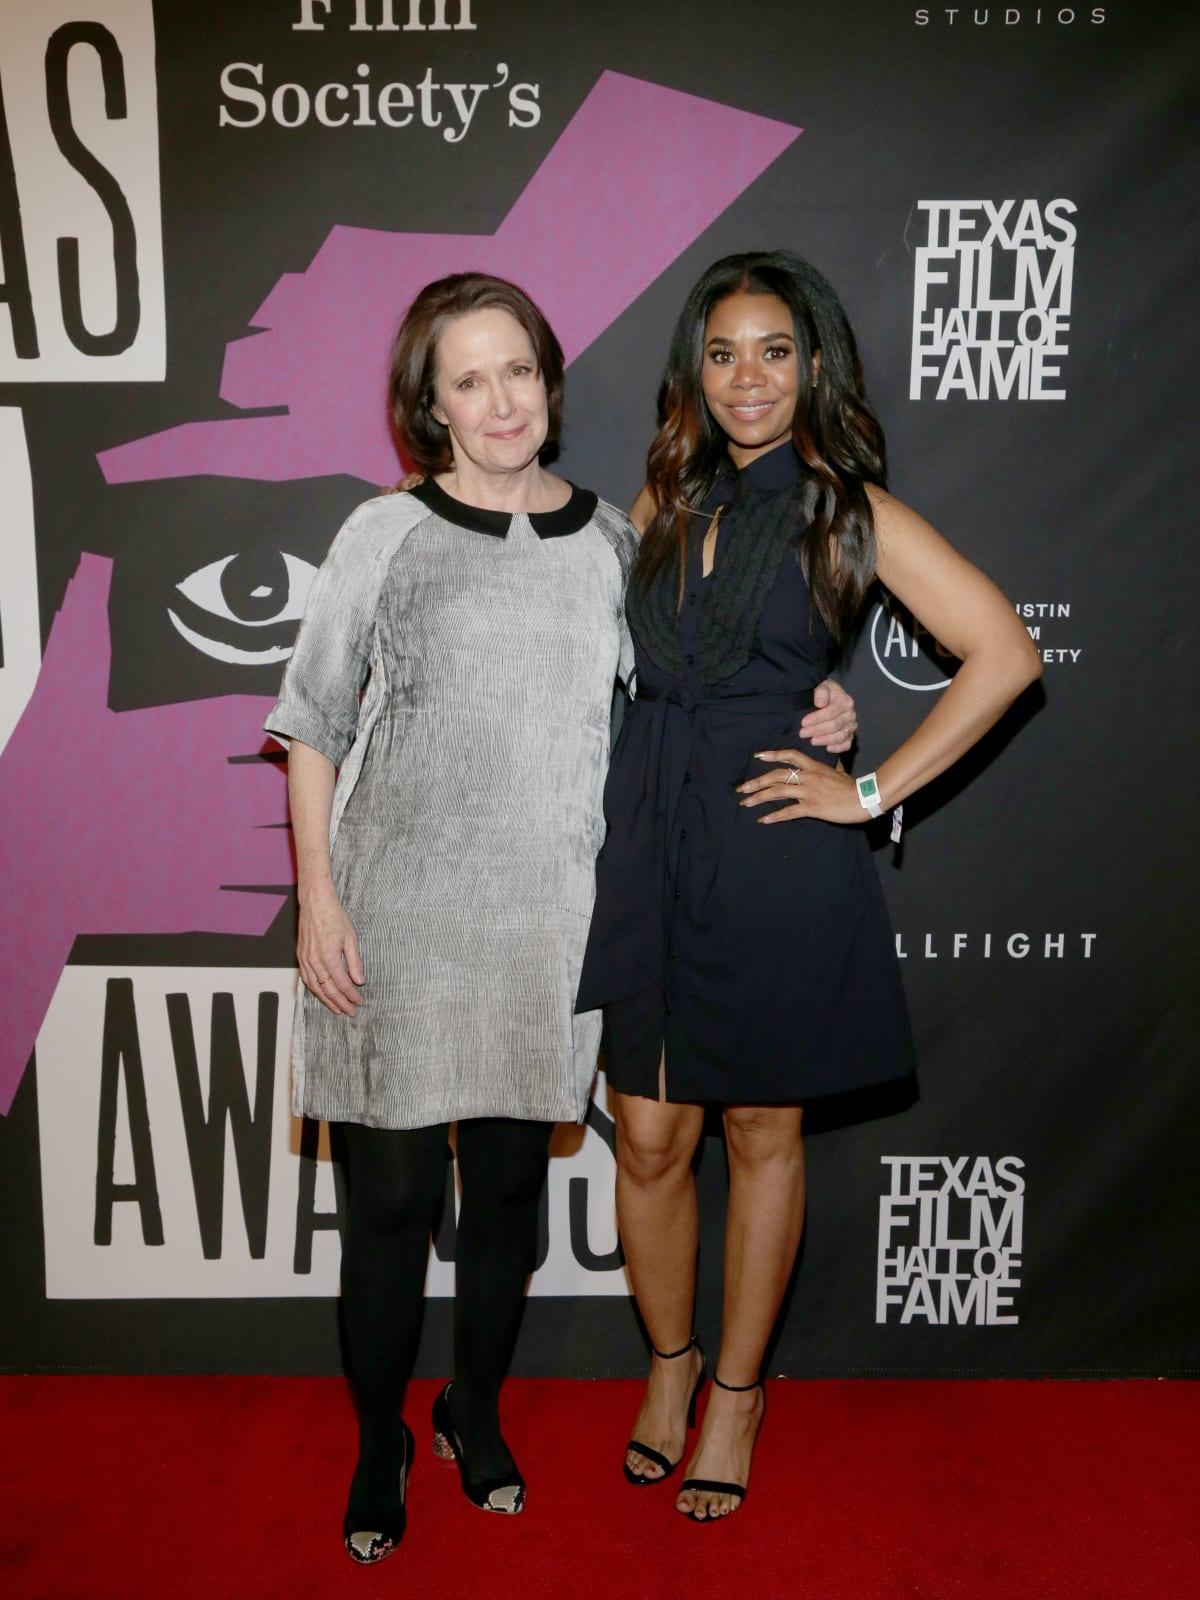 Texas Film Awards Rebecca Campbell regina Hall